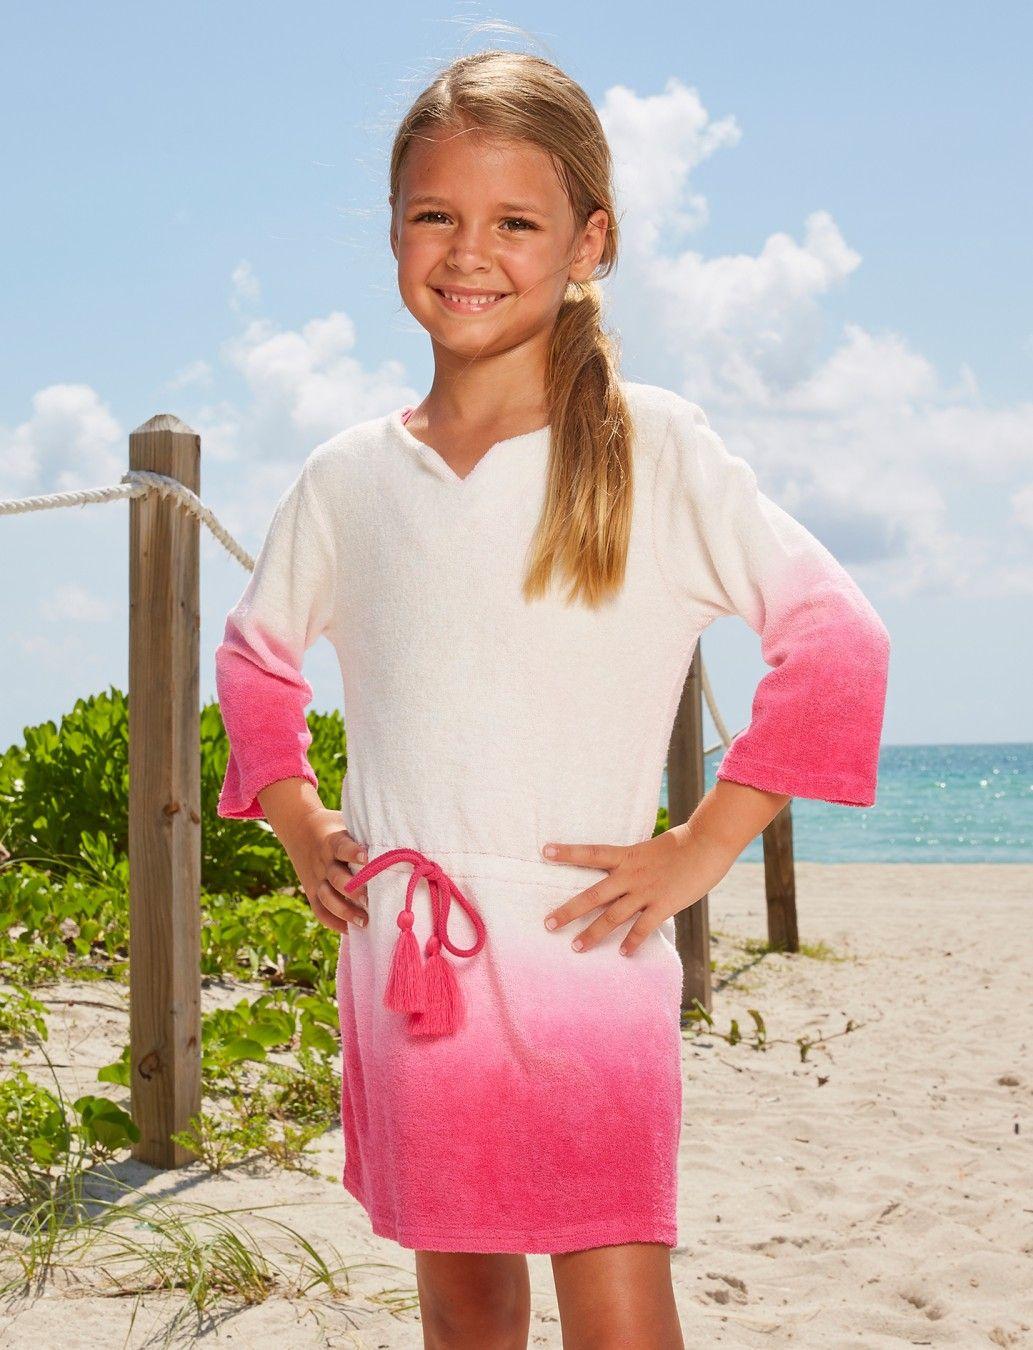 ea5108faf0 Little Girls Boho Beach Swimsuit & terry cover-up-set, 50+UPF Sun  Protective Clothing, Cabana Life